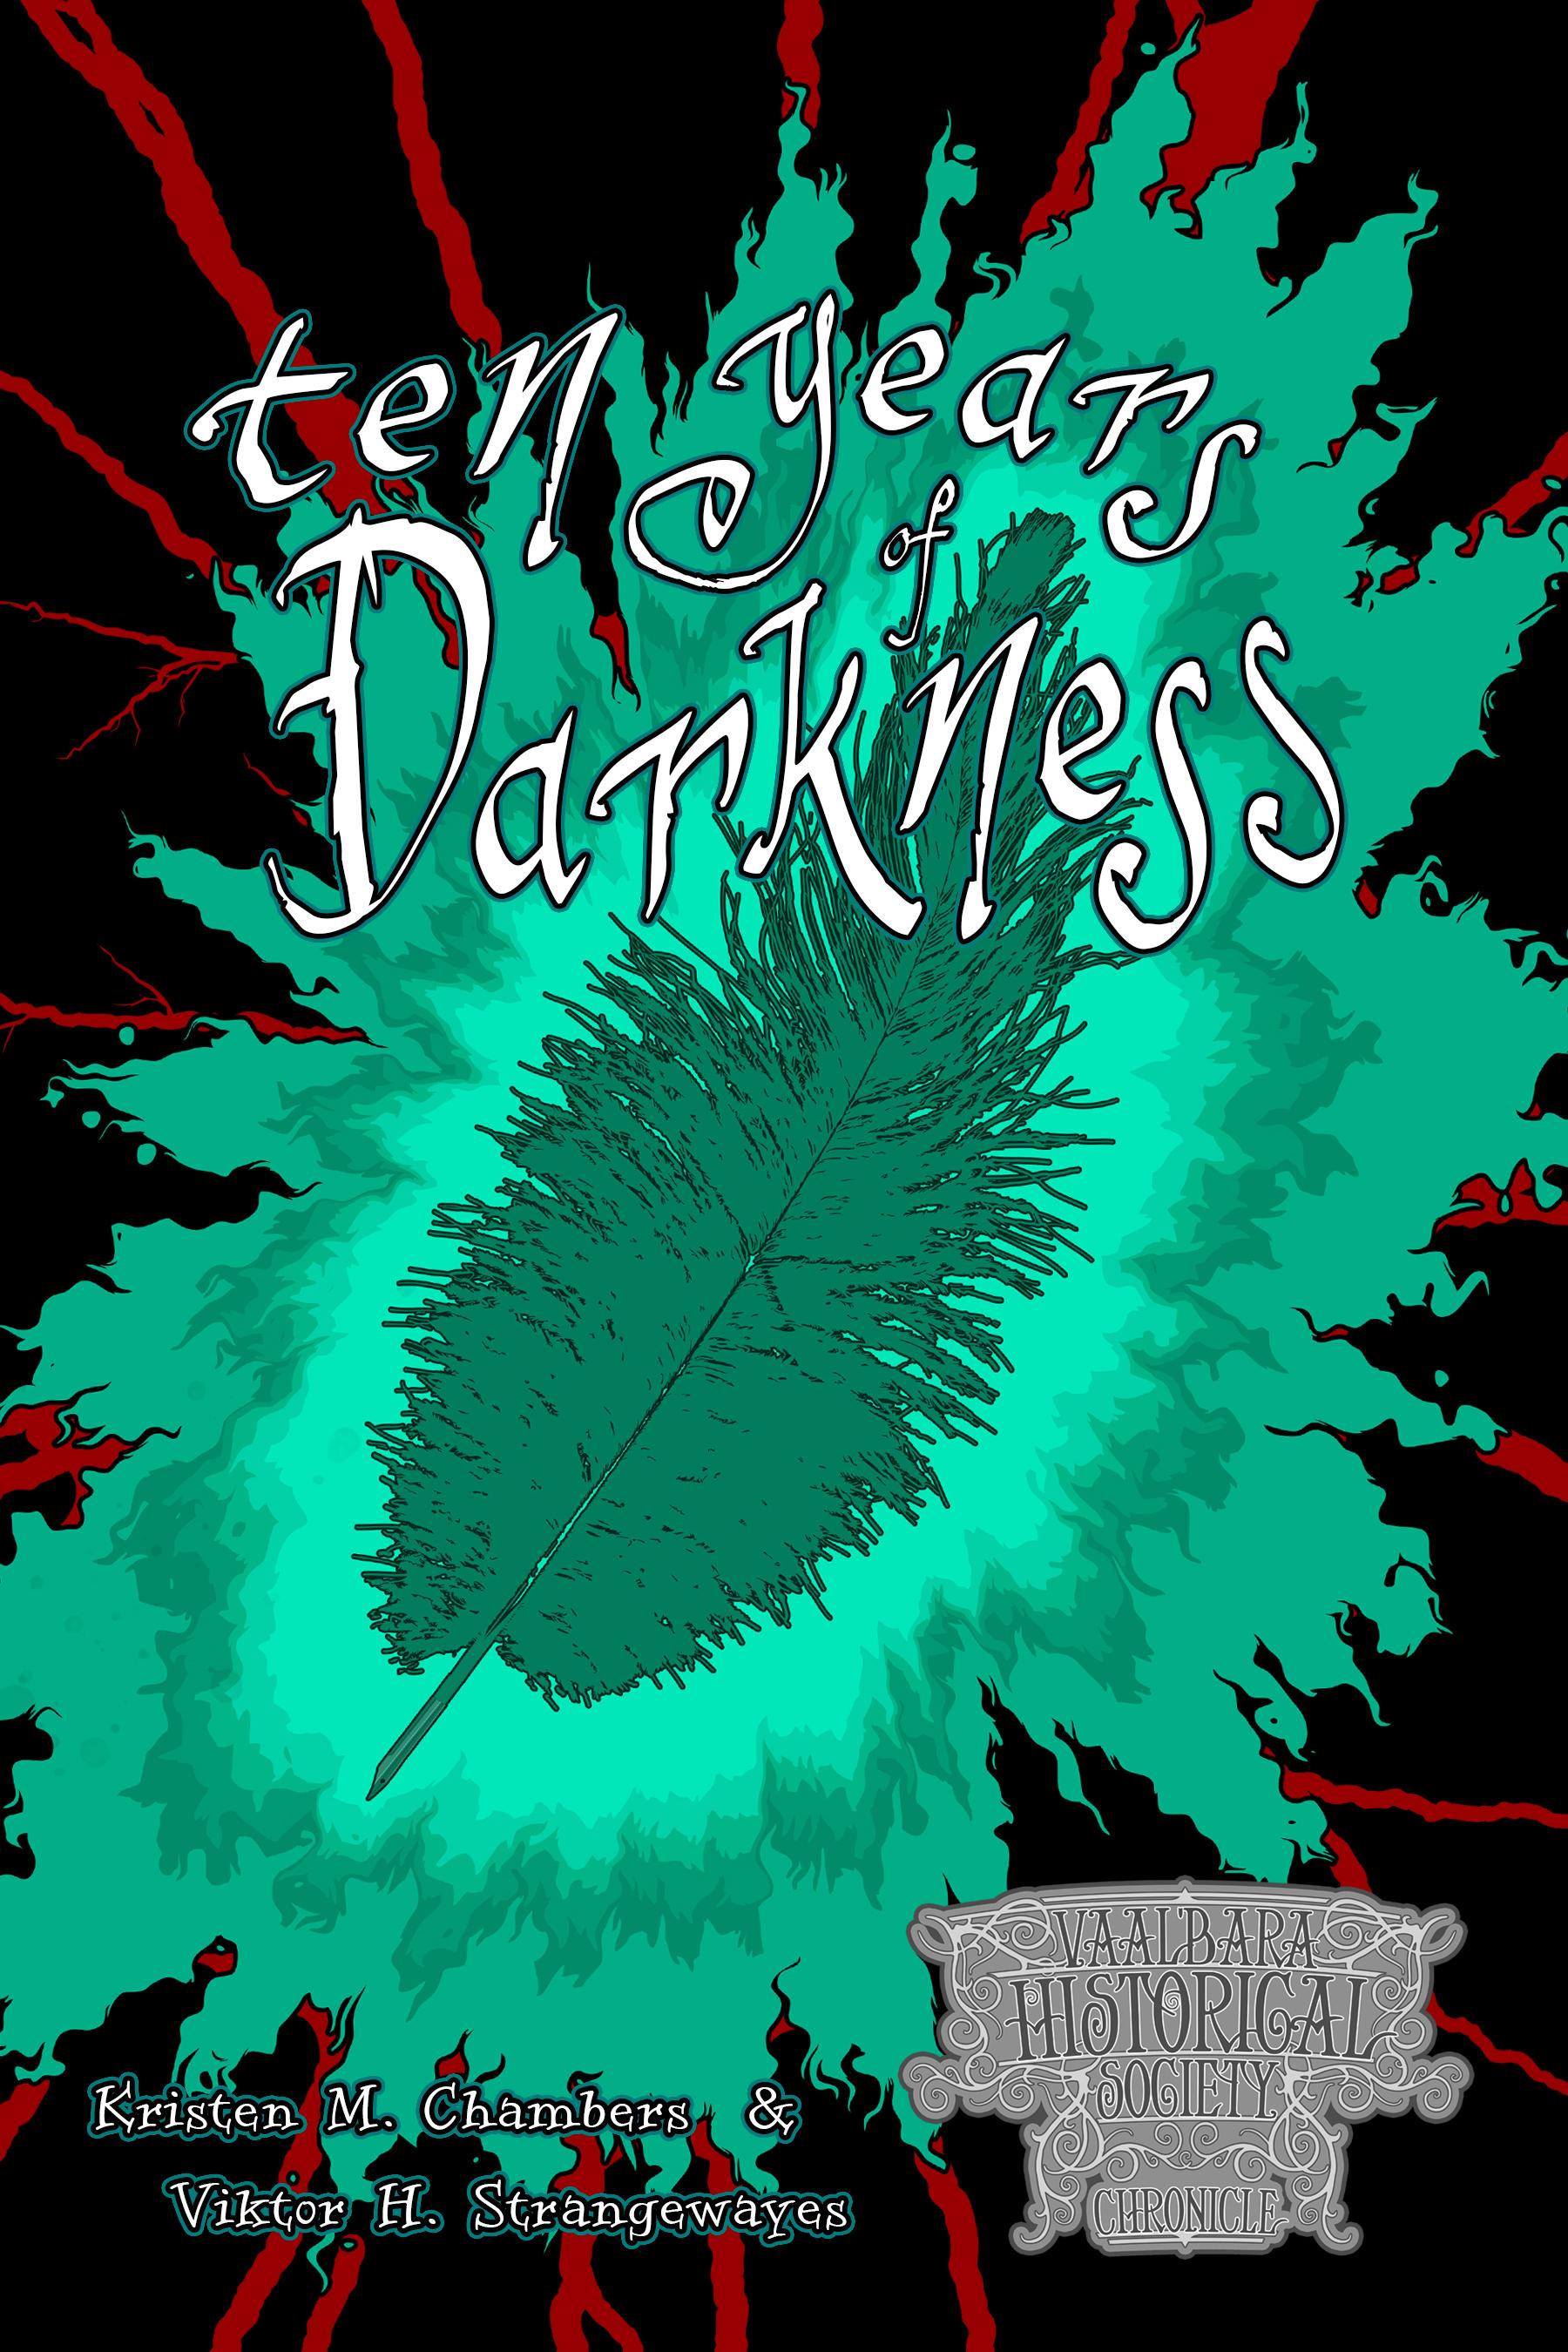 Ten Years of Darkness (Vaal'bara Historical Society #0)